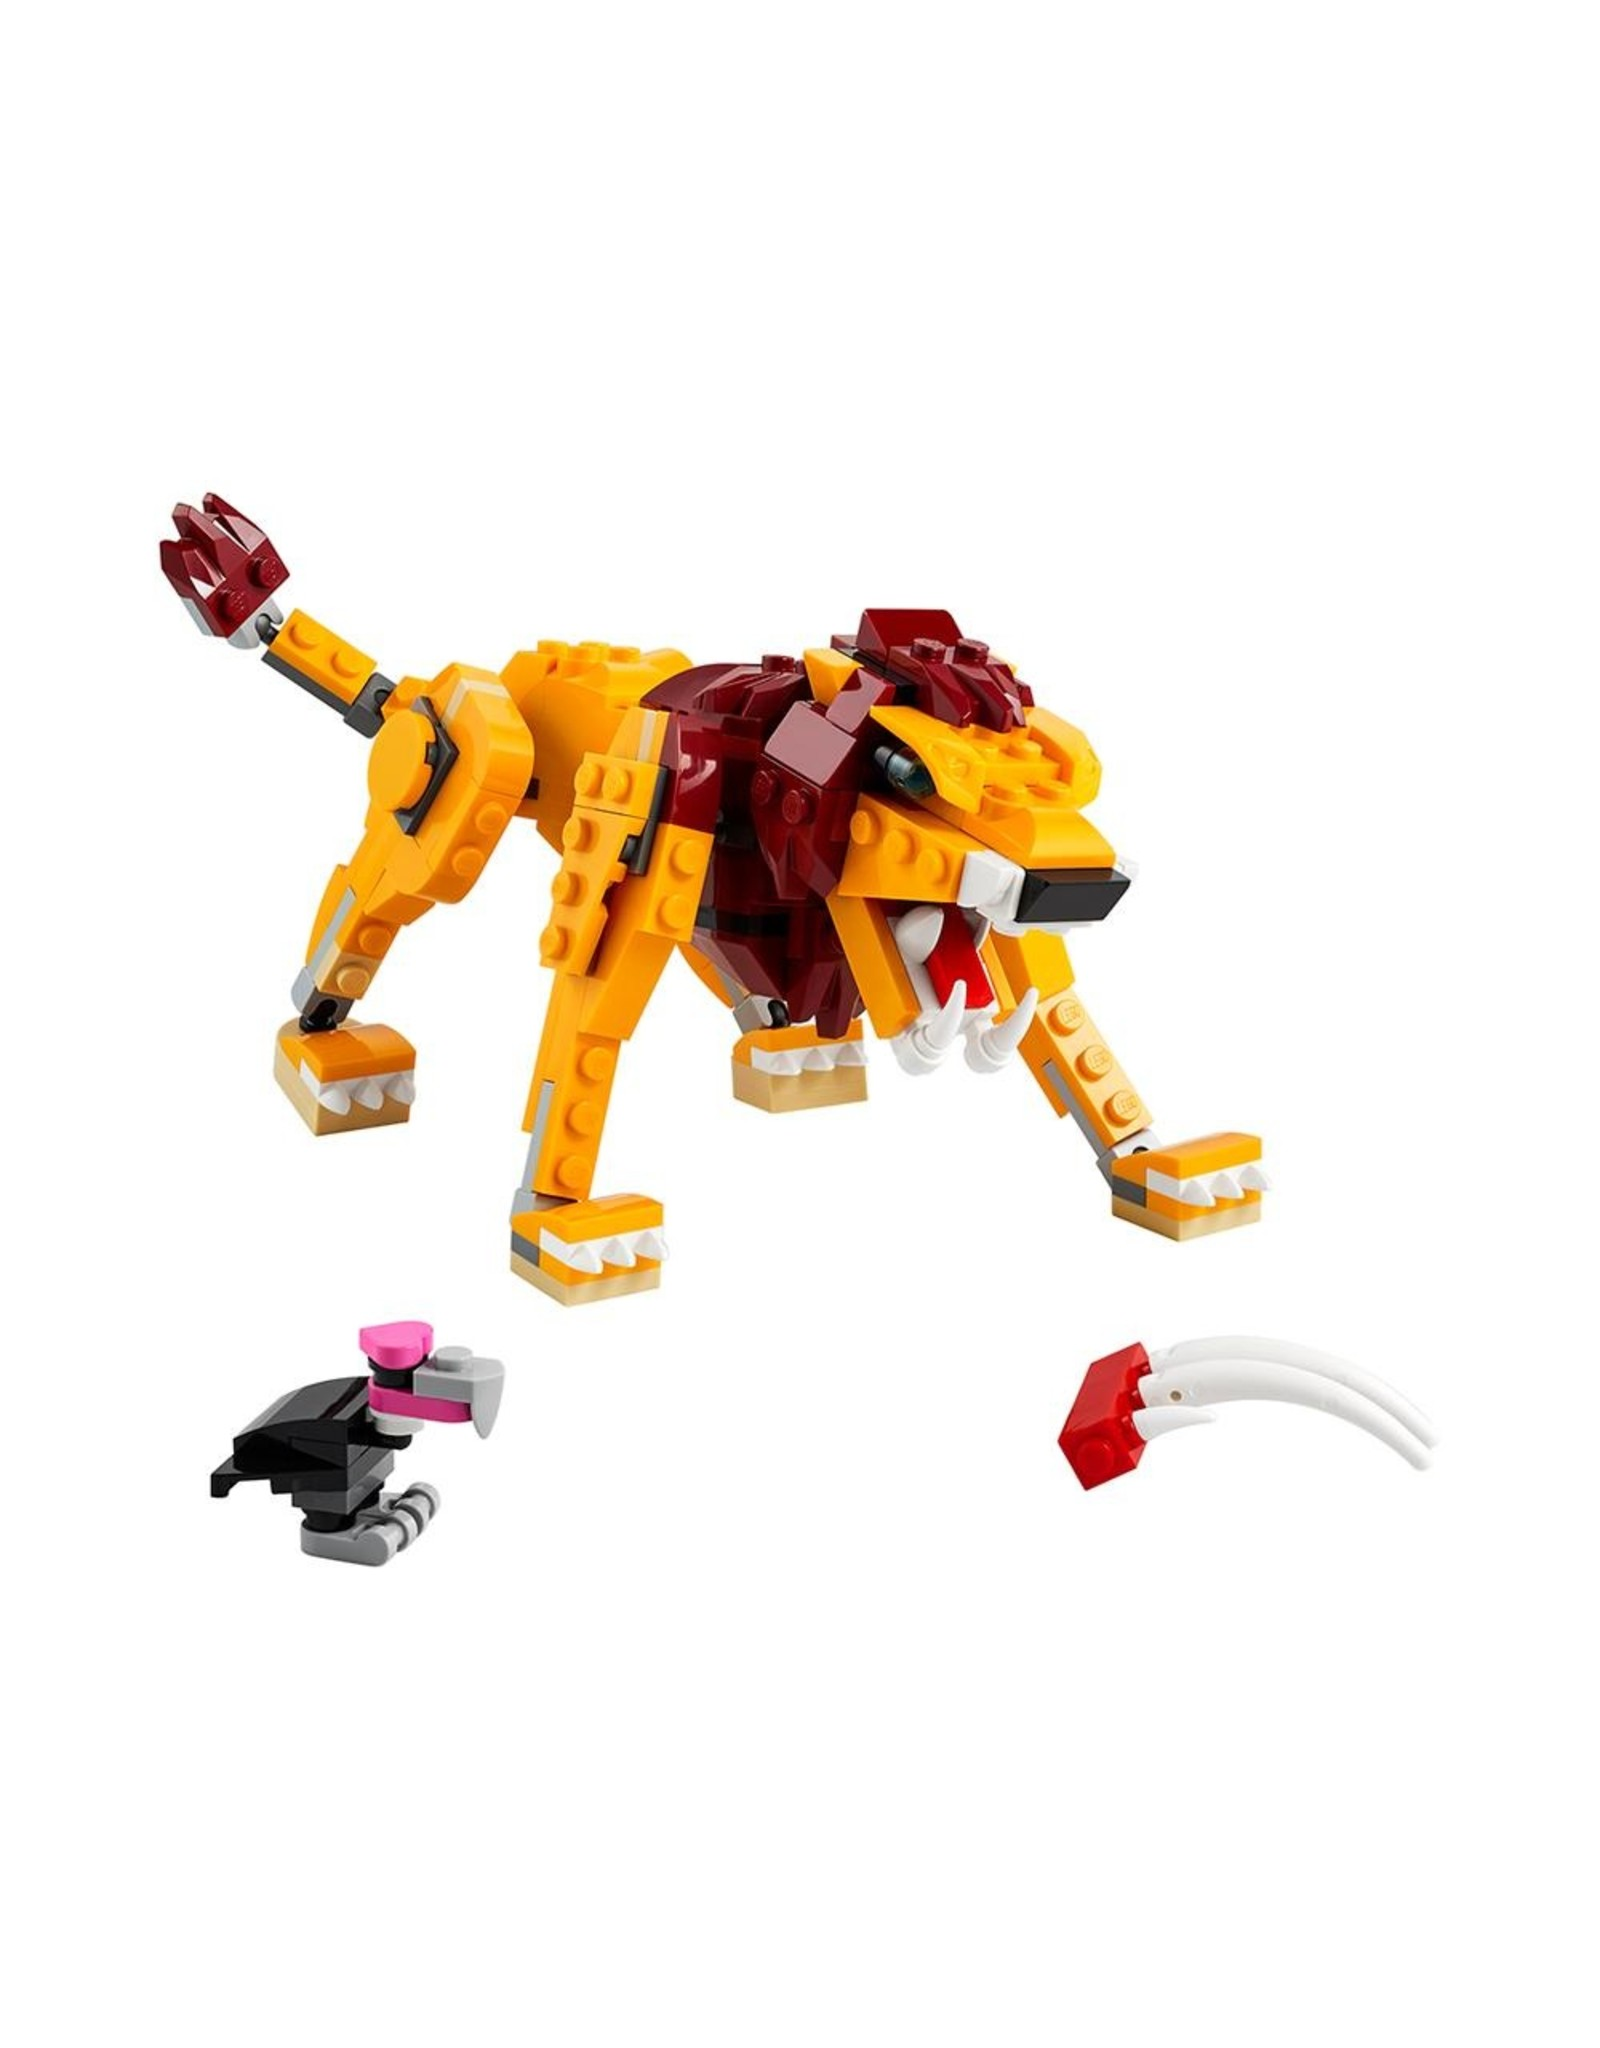 LEGO Creator - 31112 Wild Lion